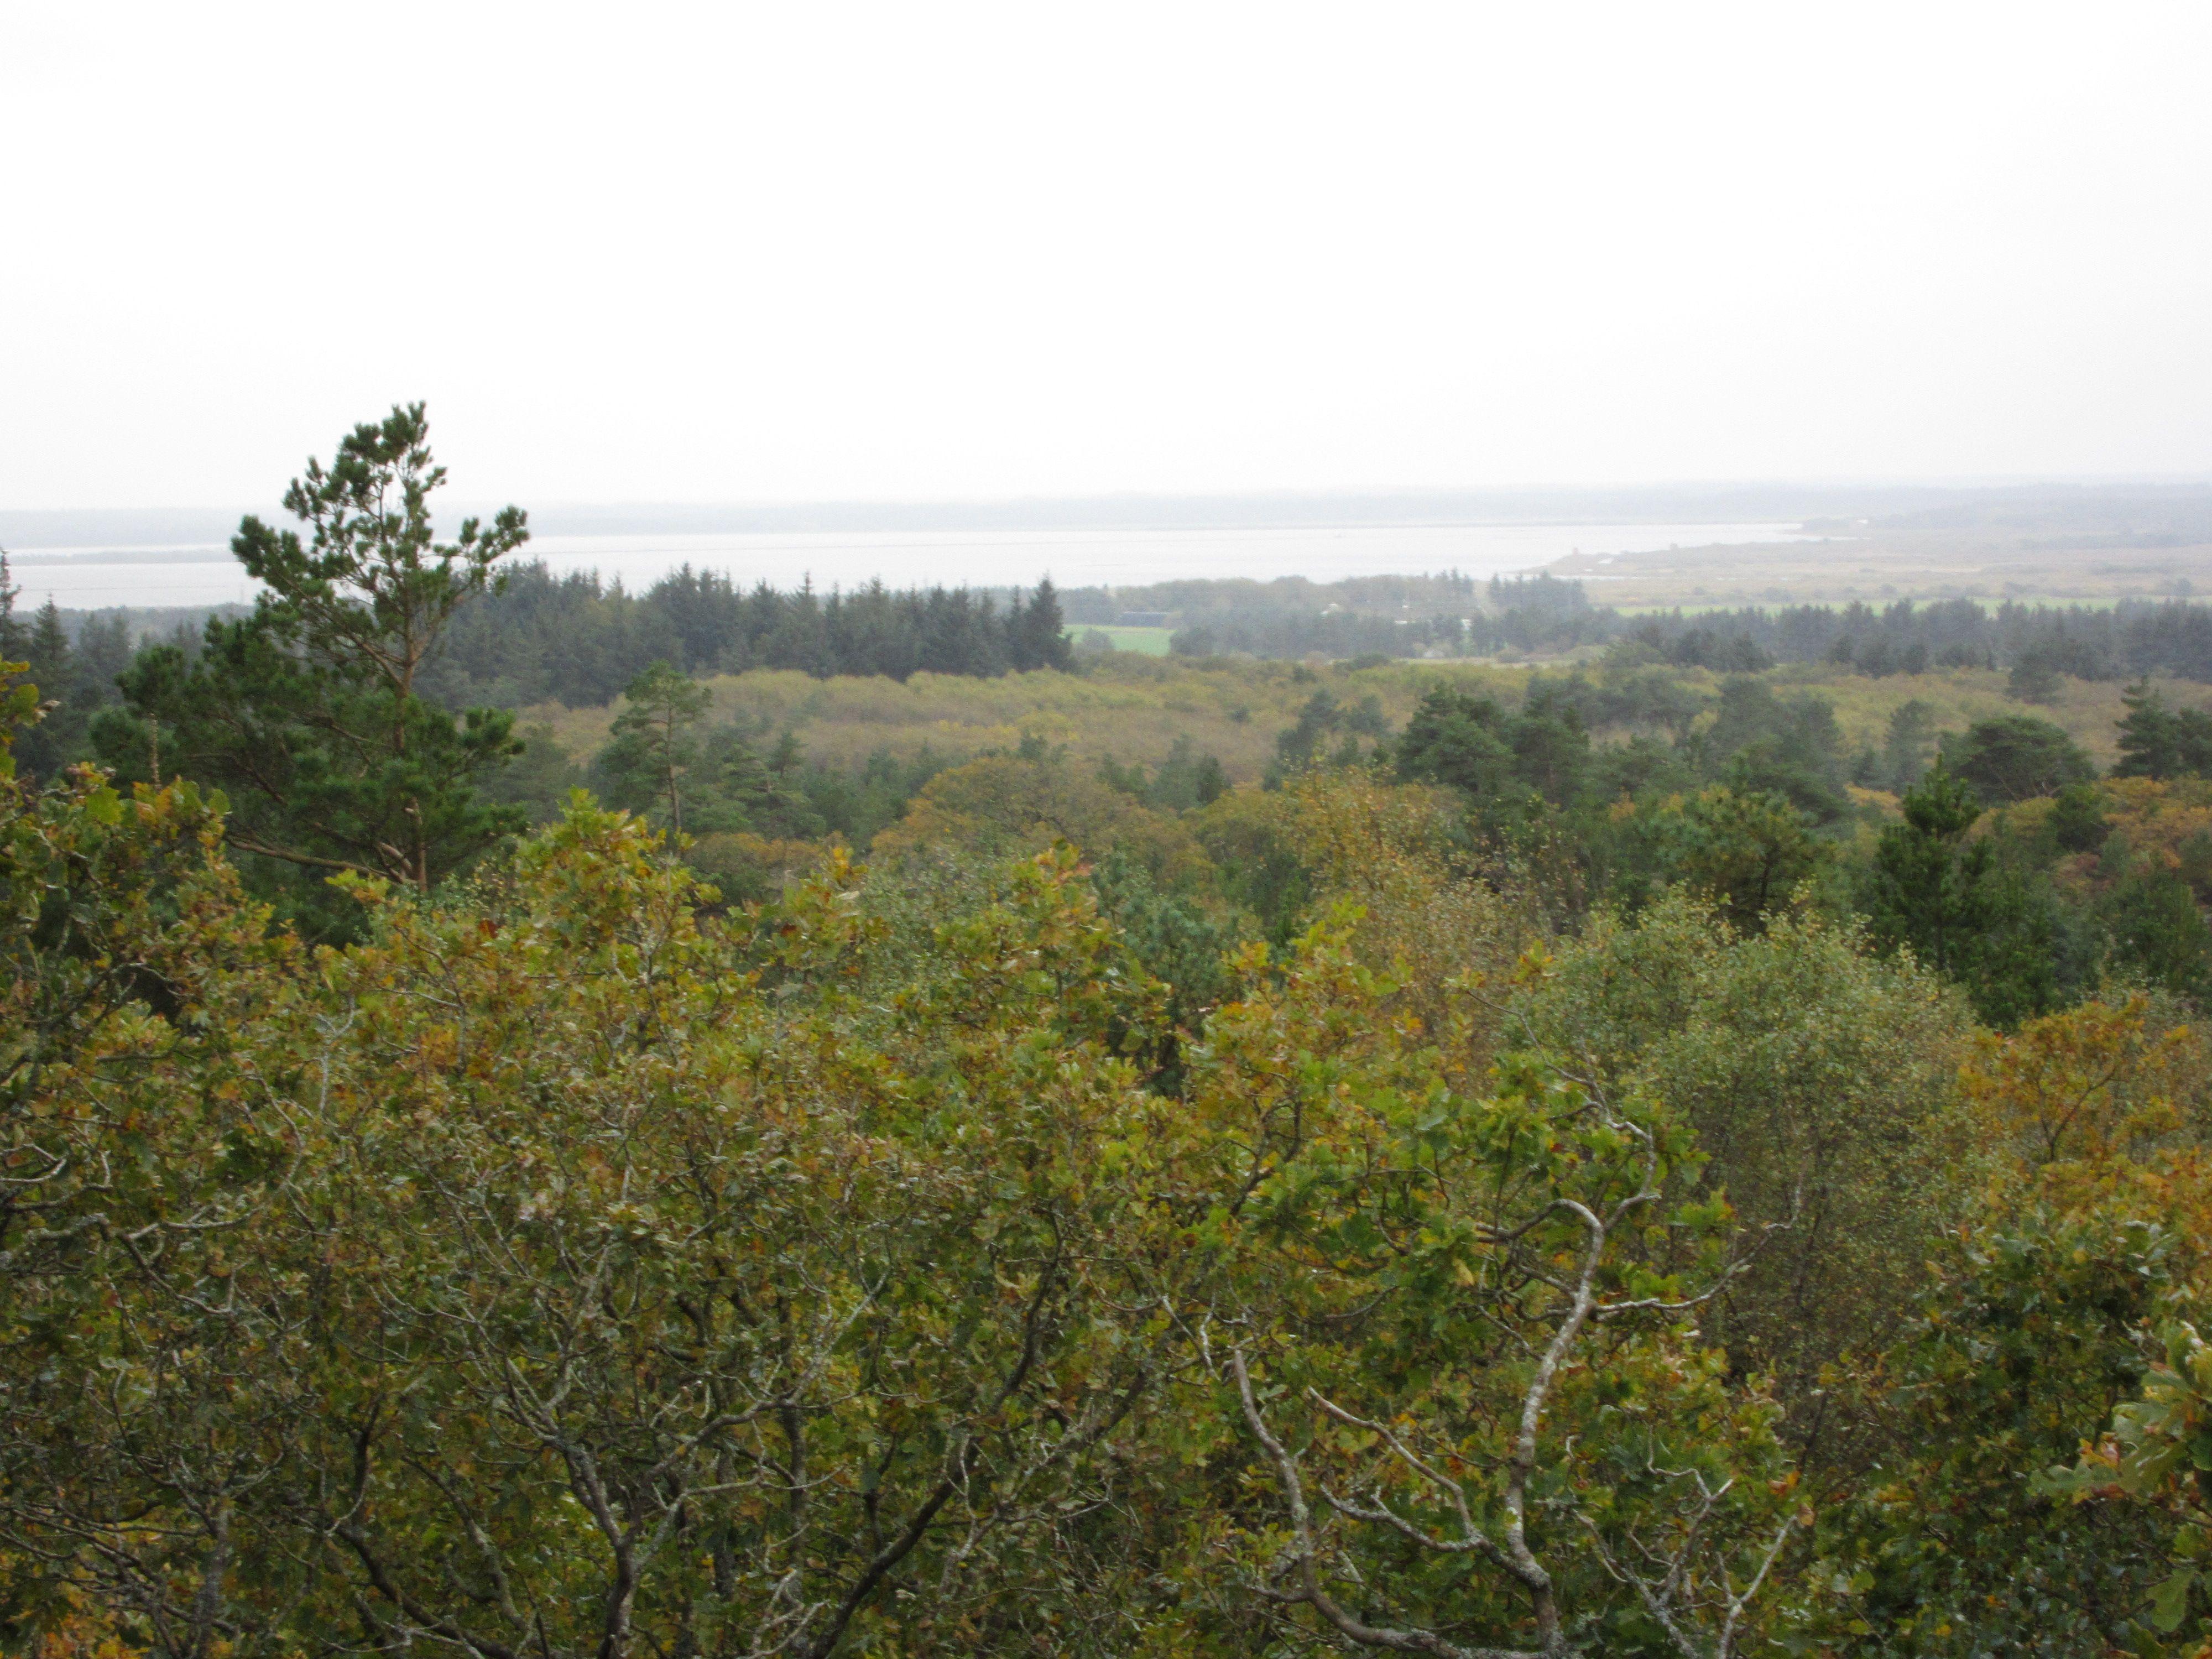 Aussicht vom Blåbjerg-Nymindegab http://www.naturstyrelsen.dk/Udgivelser/Vandretursfoldere/Tysk/Blaa_nymind.htm #Blåbjerg